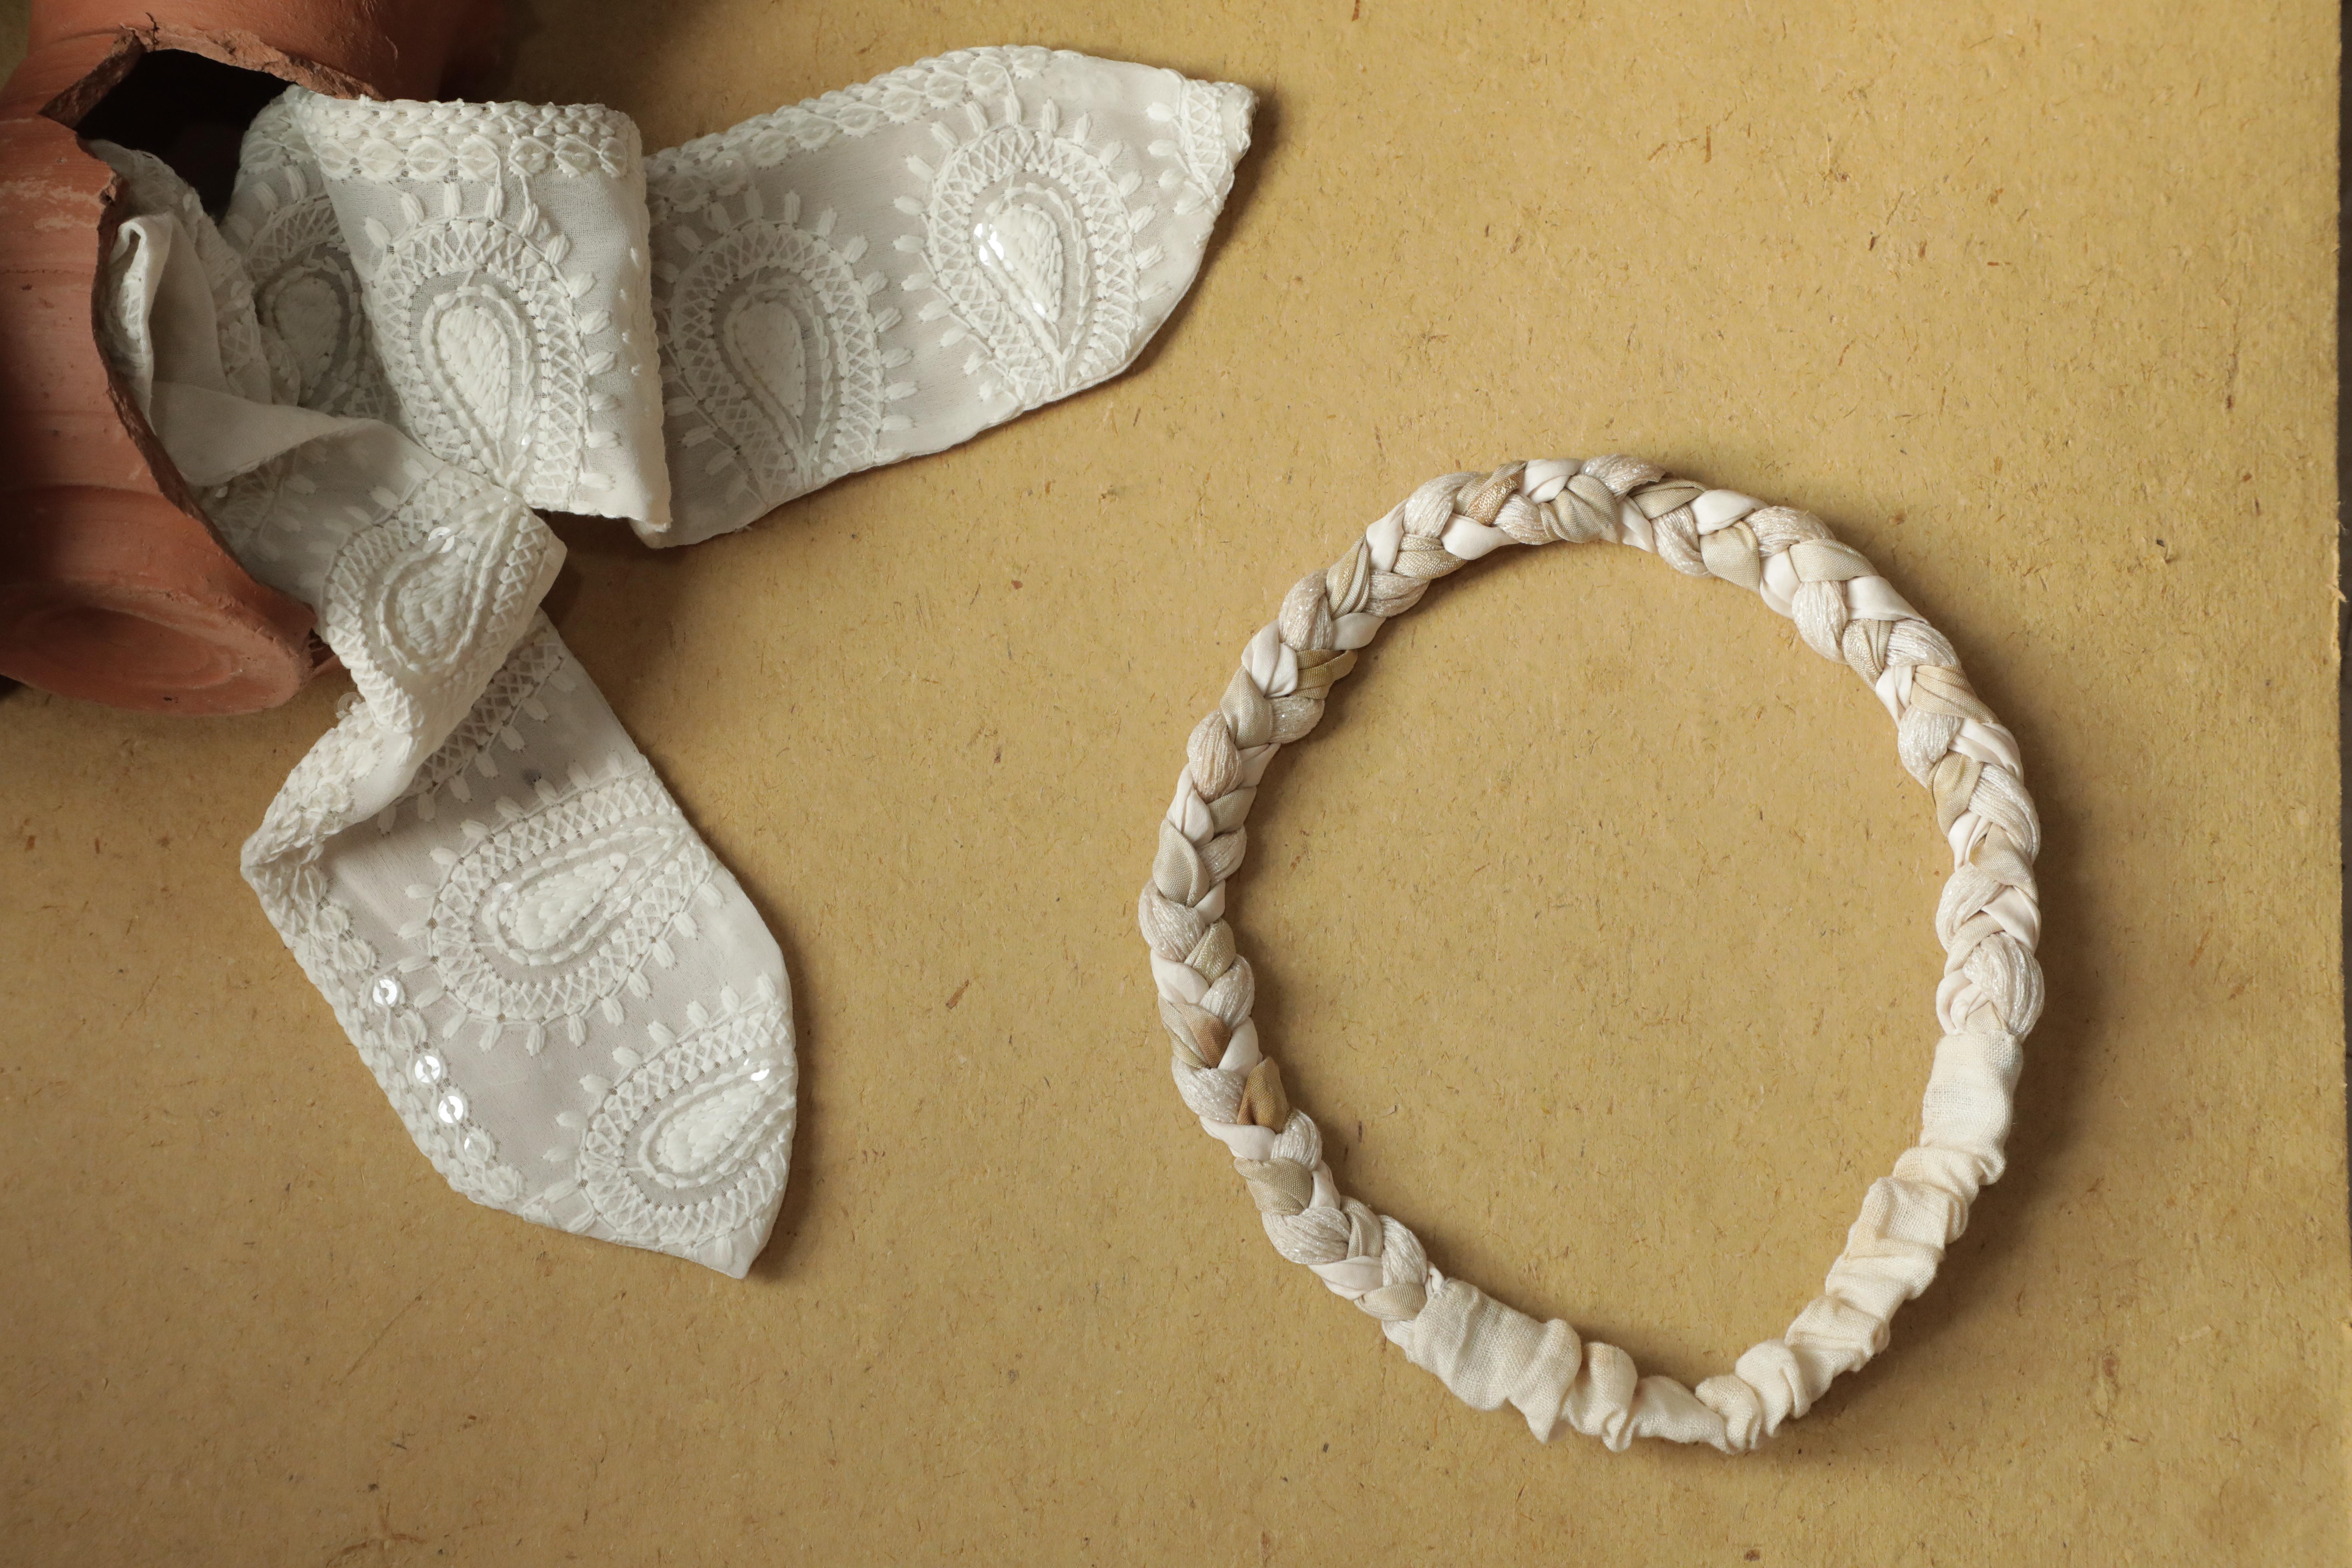 Ayur Herb Upcycled Headband